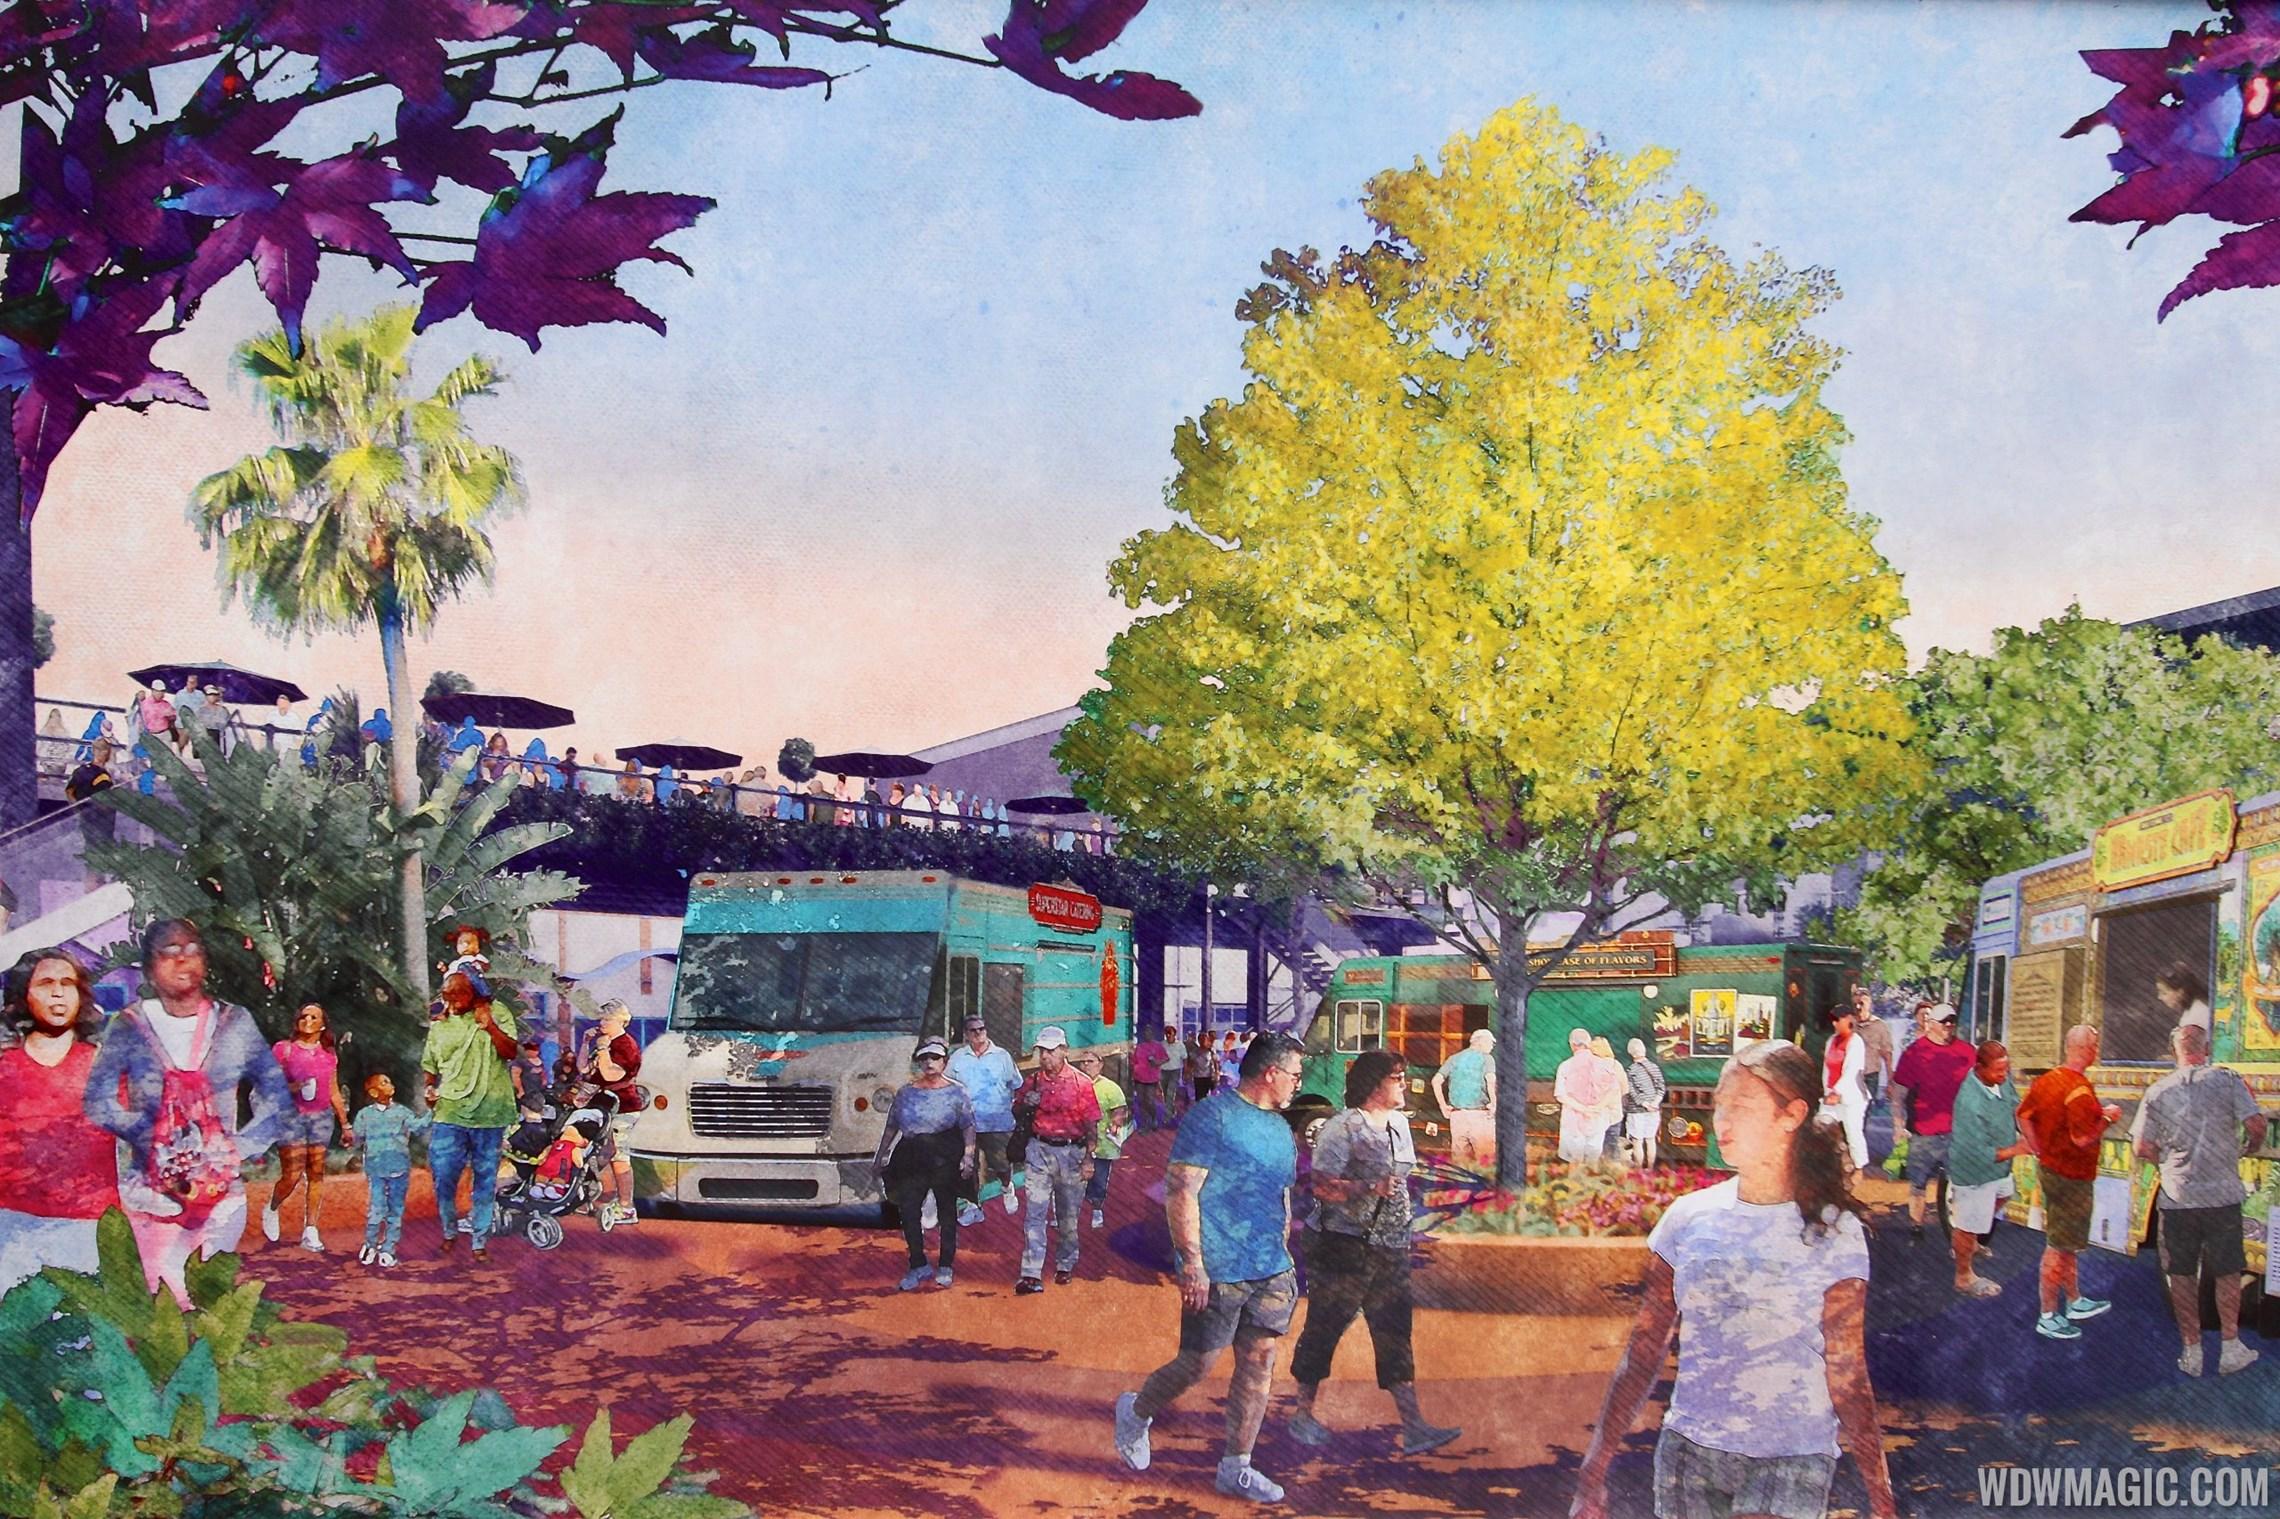 Food Truck Park concept art